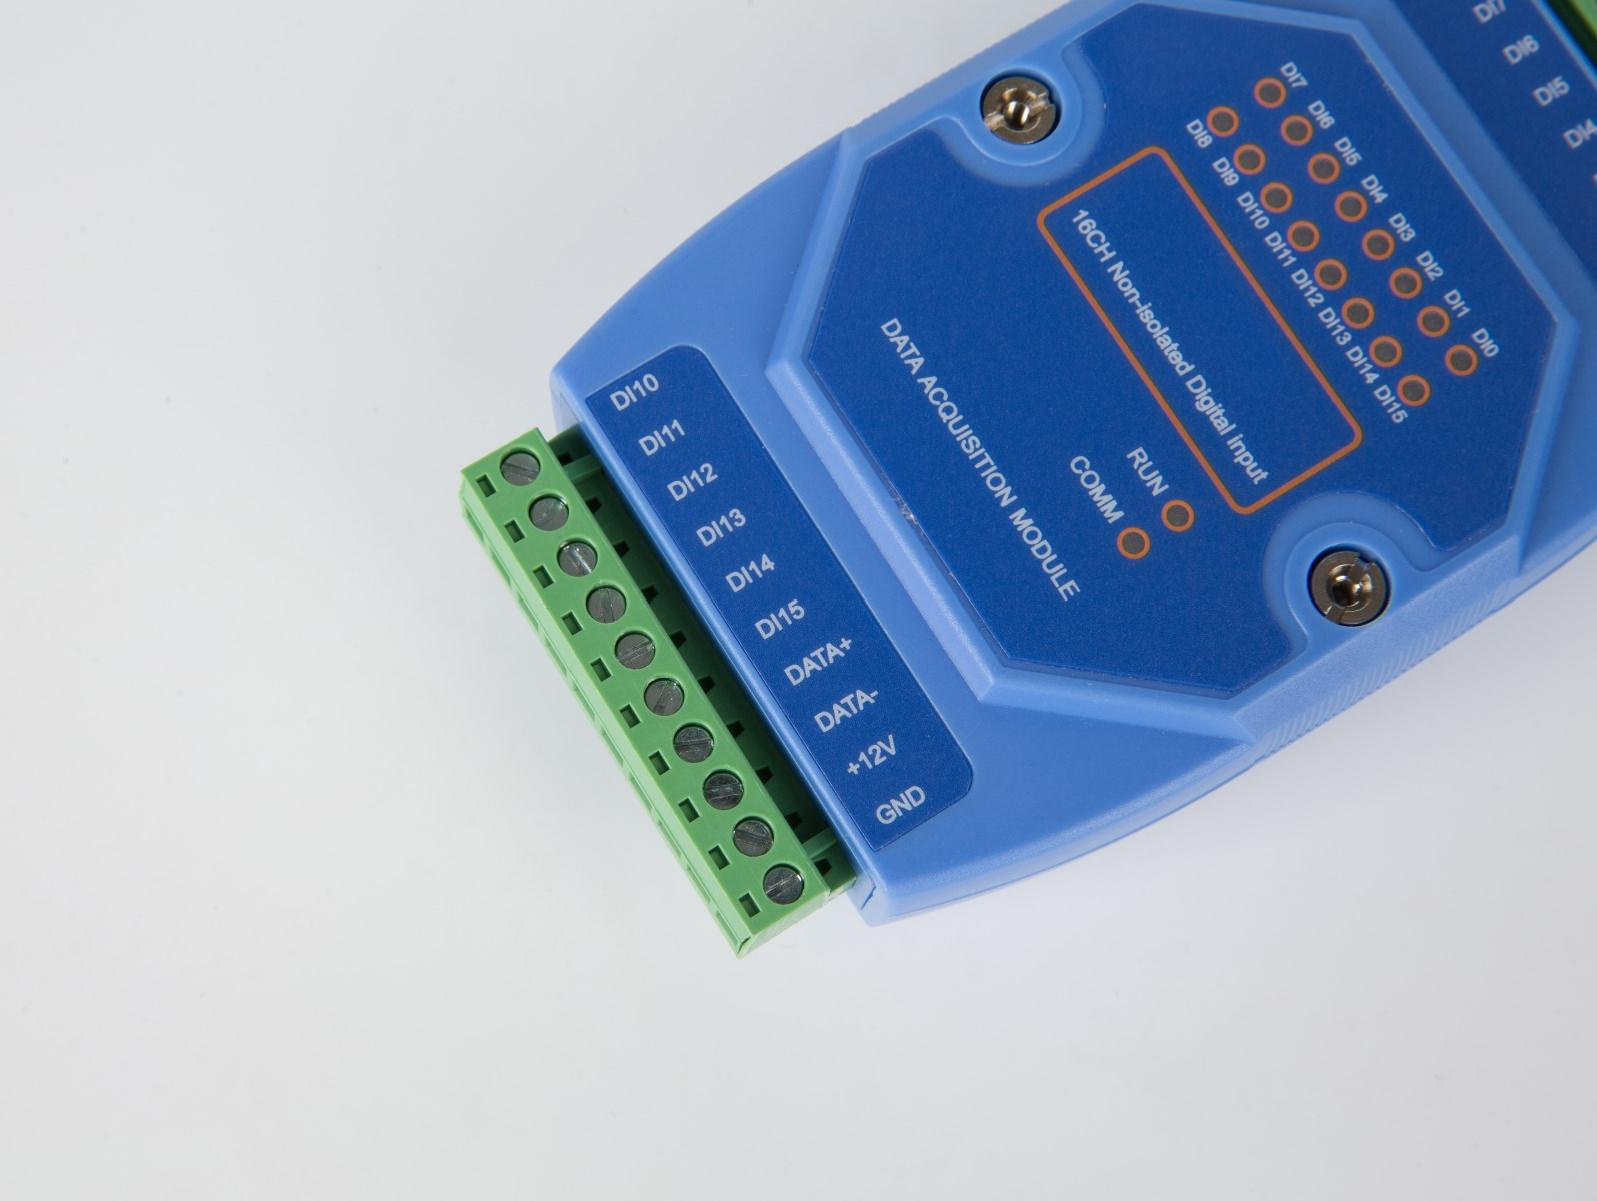 16路开关量采集模块OM-ACC-A104